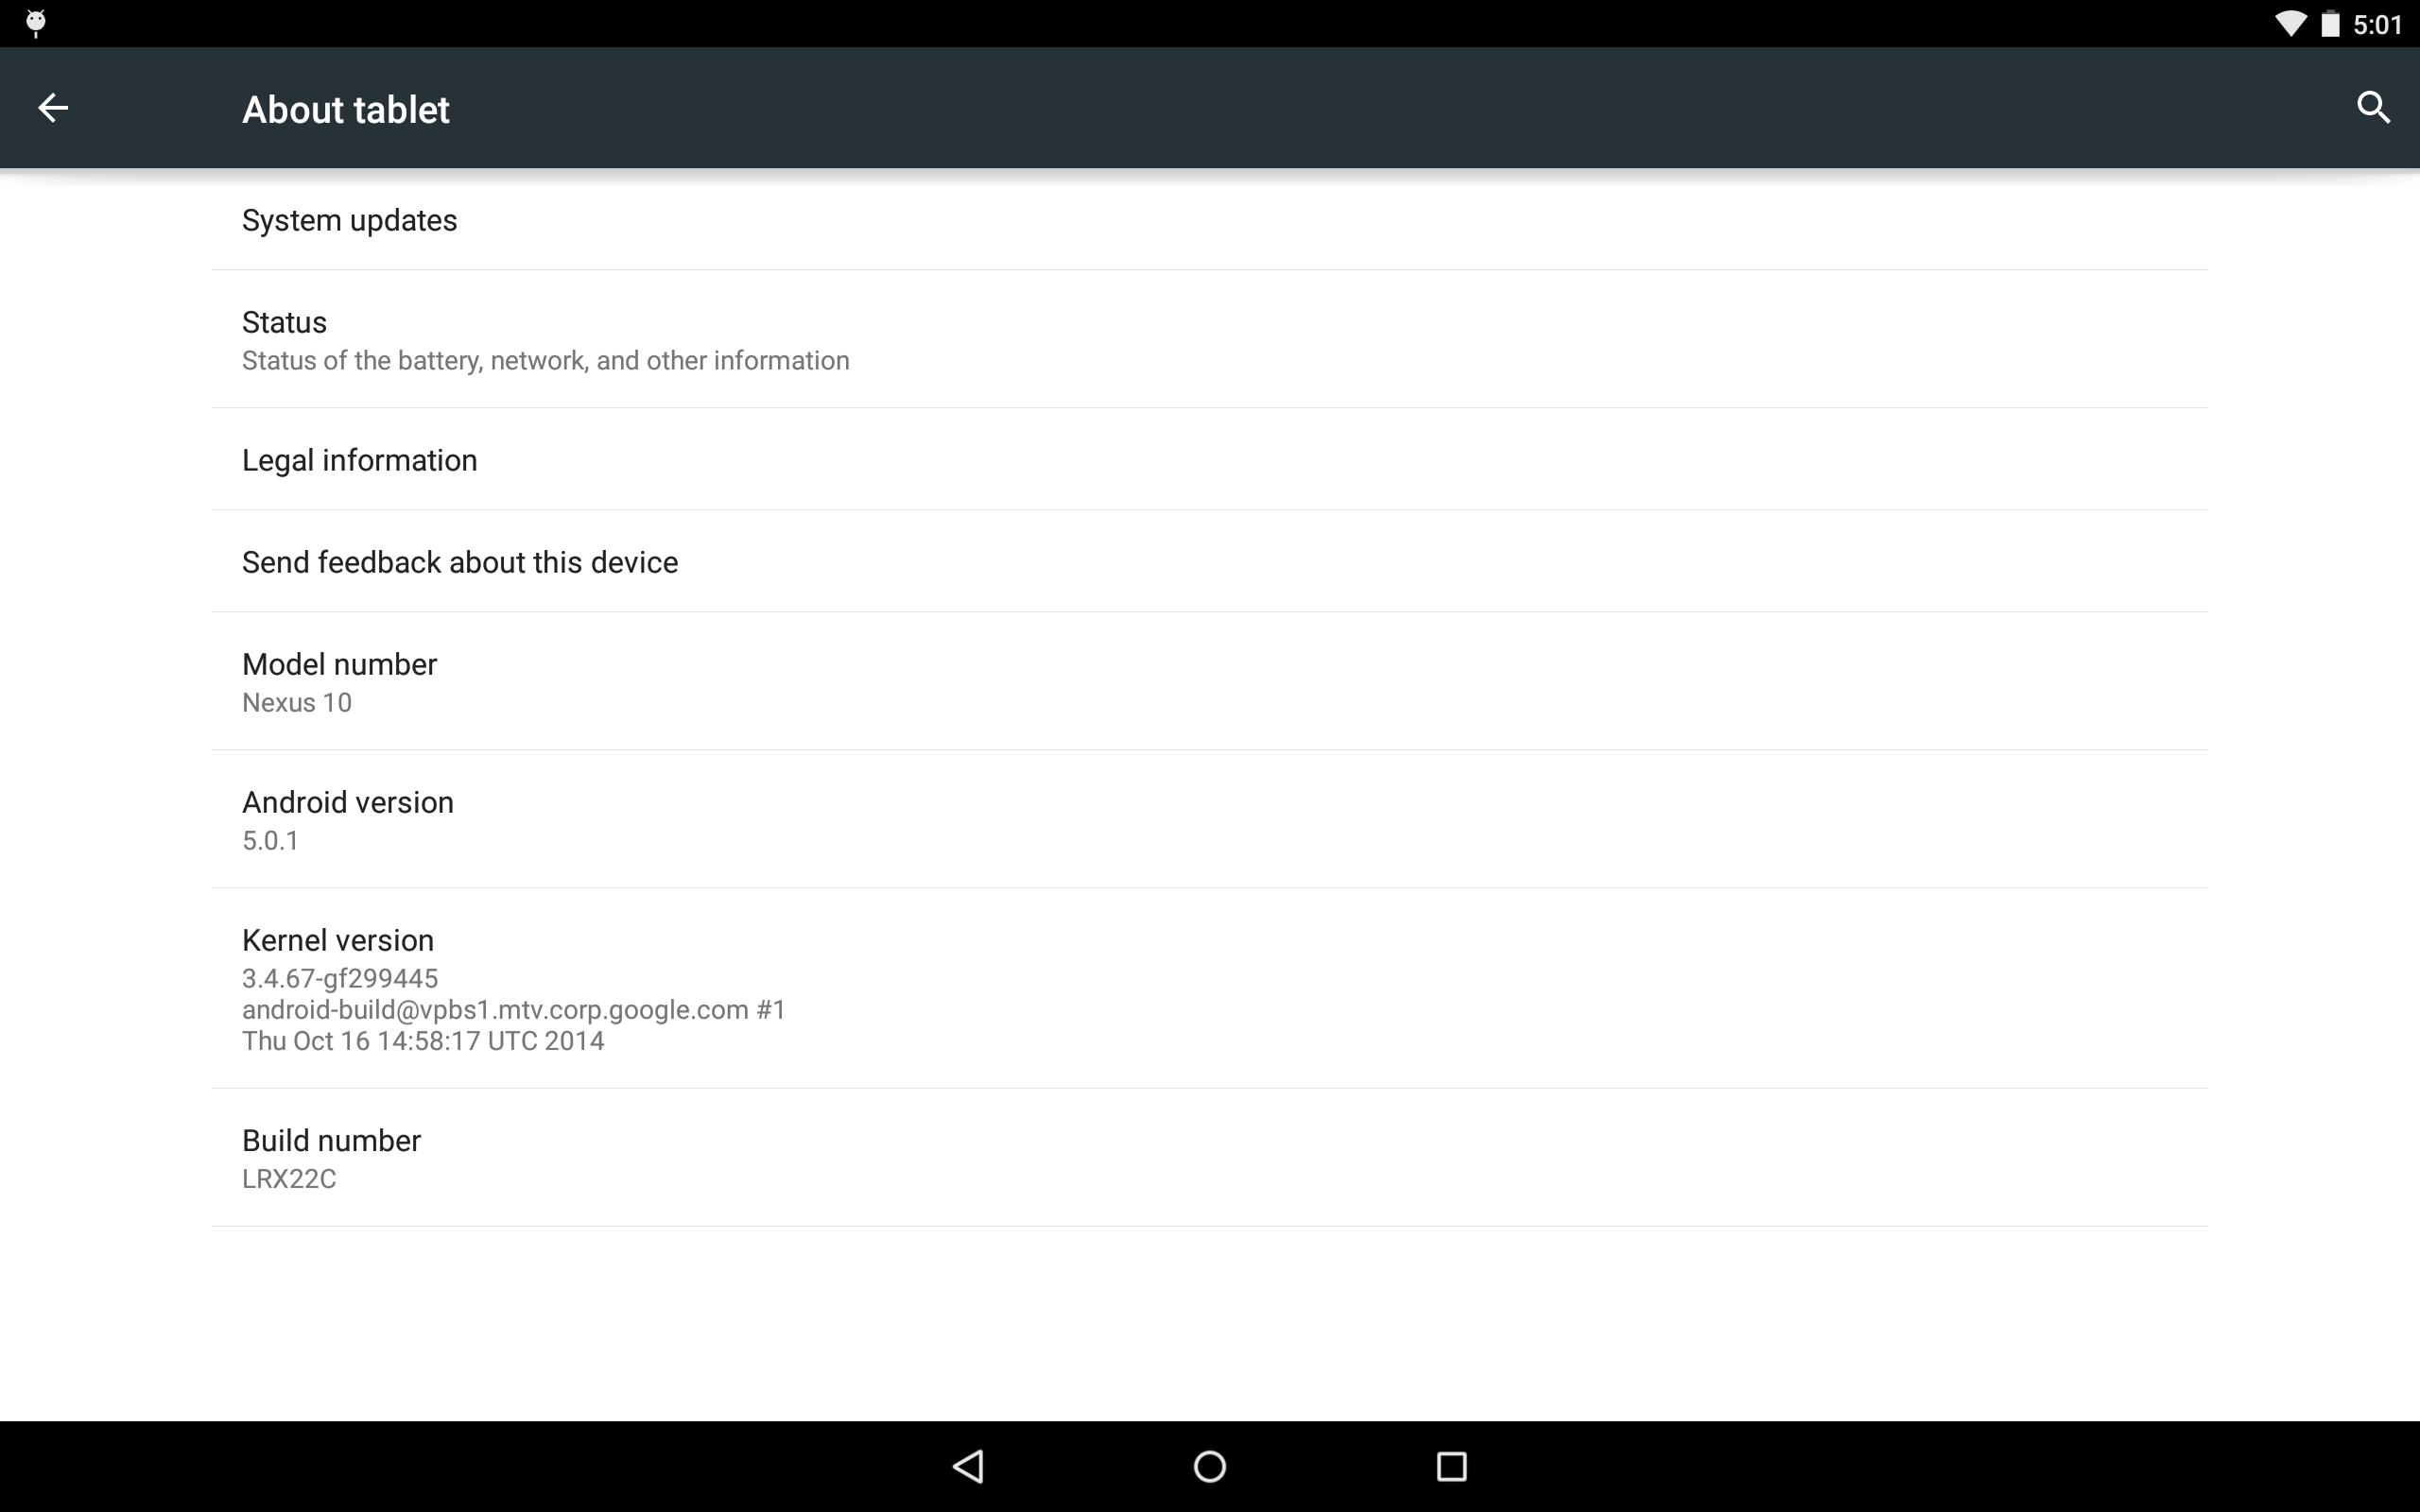 android 5.0.1 ota